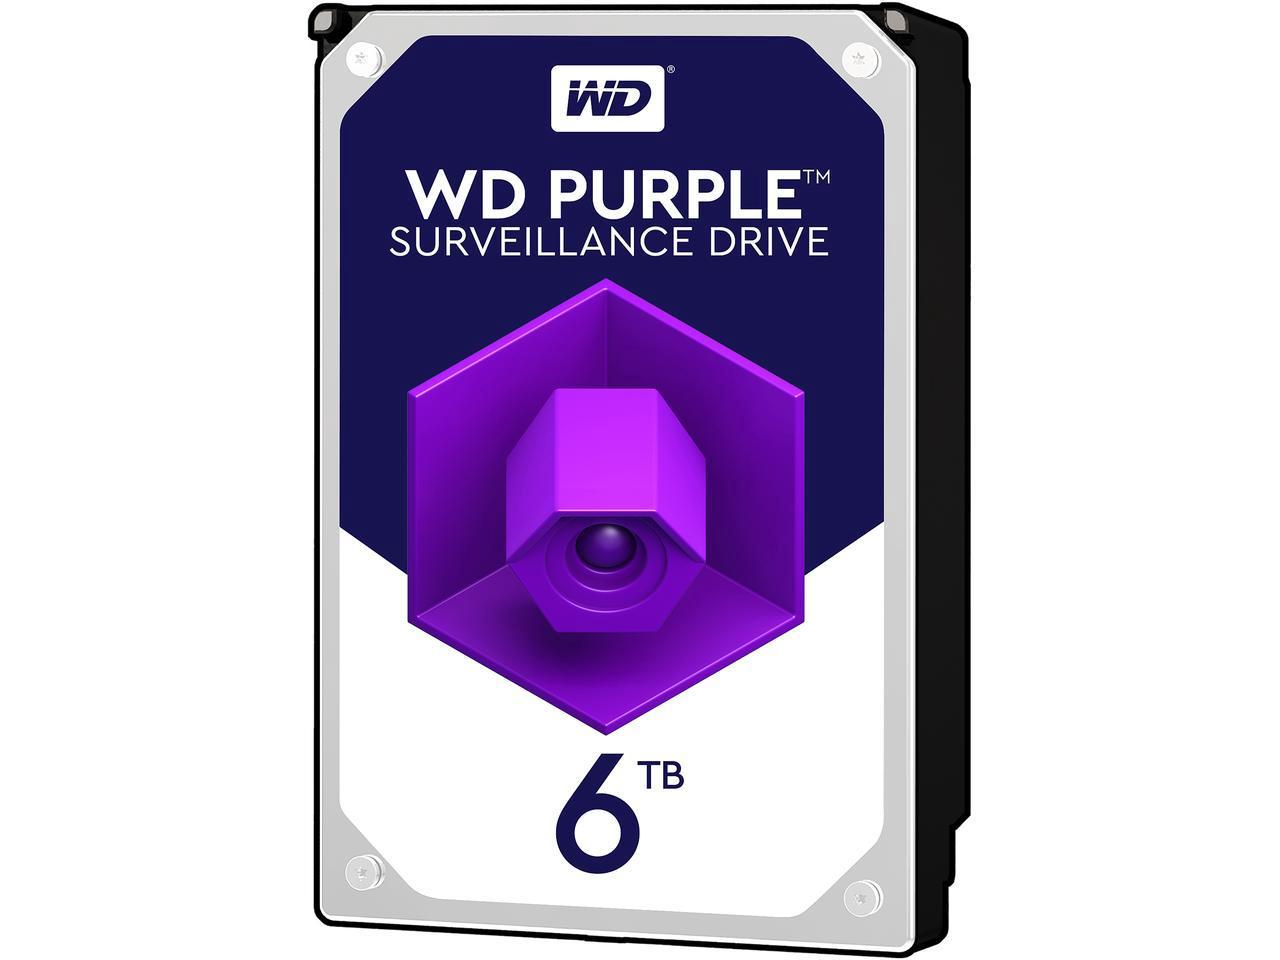 WD Purple 6TB Surveillance Hard Disk Drive - 5400 RPM Class SATA 64MB Cache 3.5 Inch $179.99